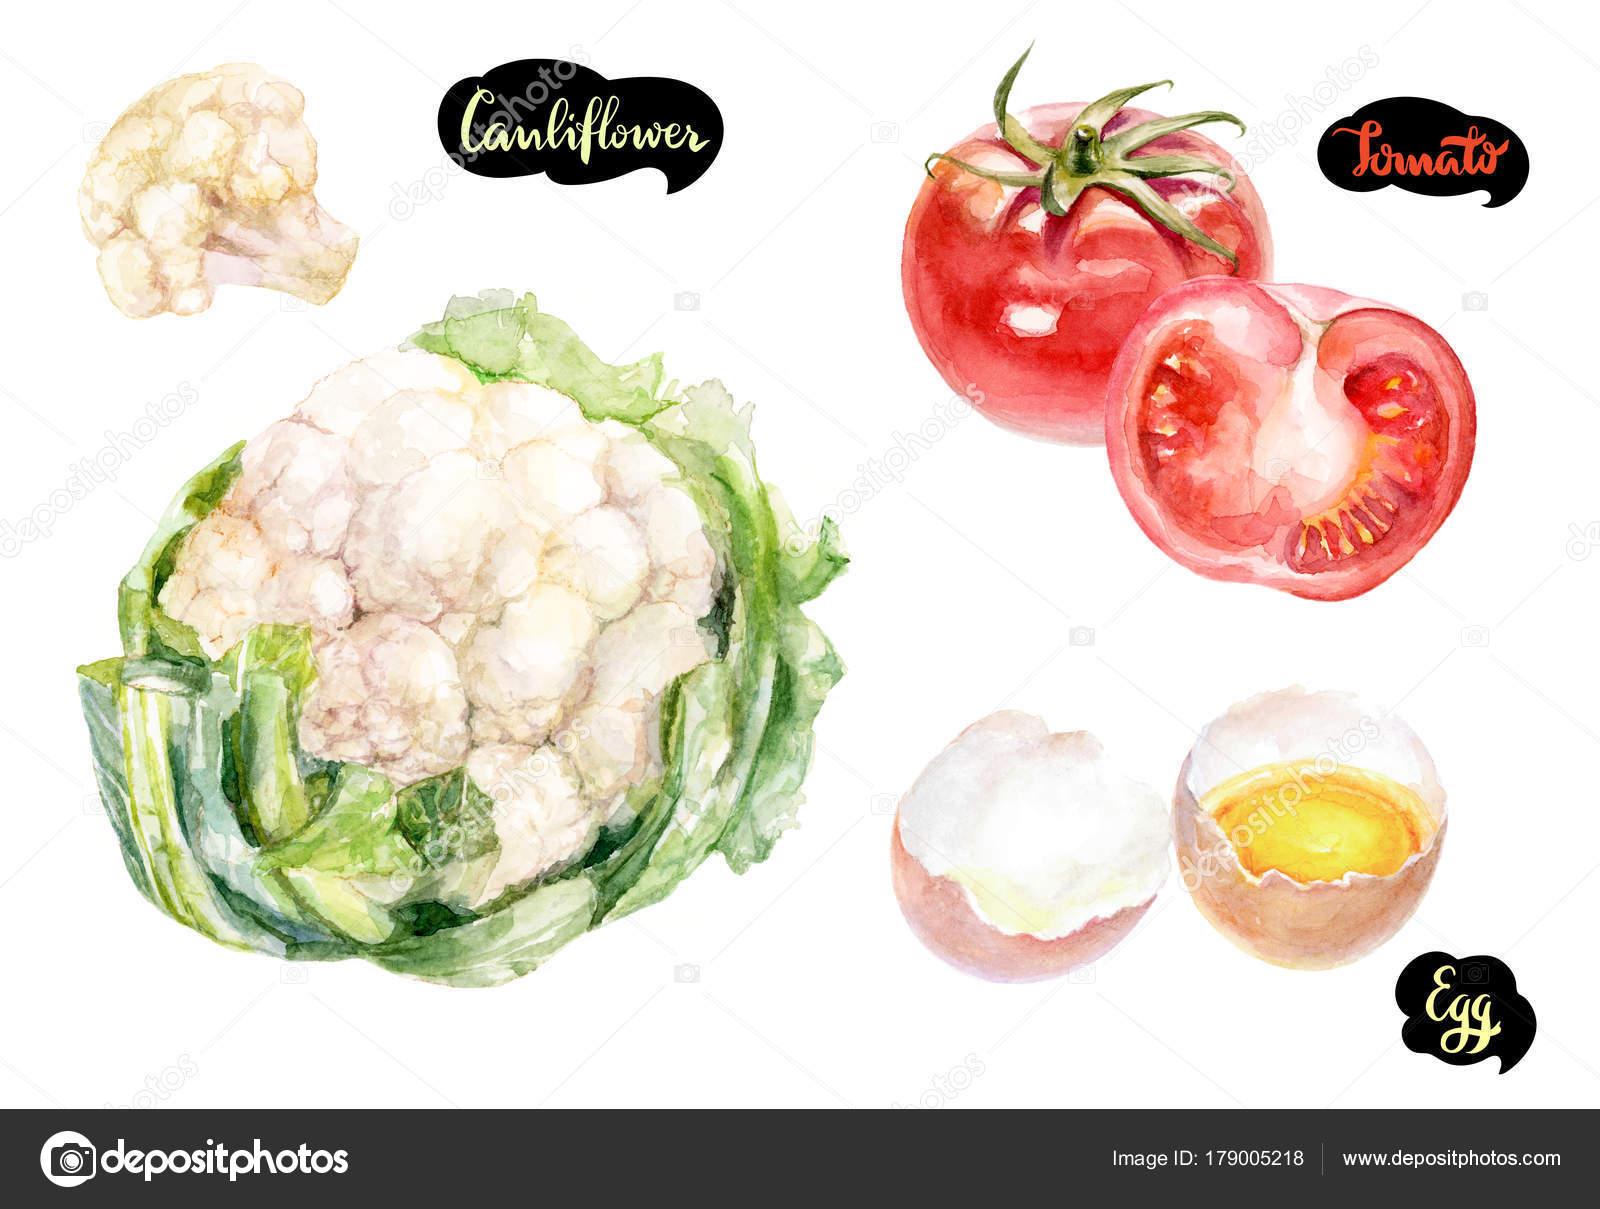 kitchen herb kit outdoor sink 香草和香料厨房水彩套装花椰菜洋葱水彩手绘插图在白色背景上被隔离 图库 香草和香料厨房水彩套装花椰菜洋葱水彩手绘插图在白色背景上被